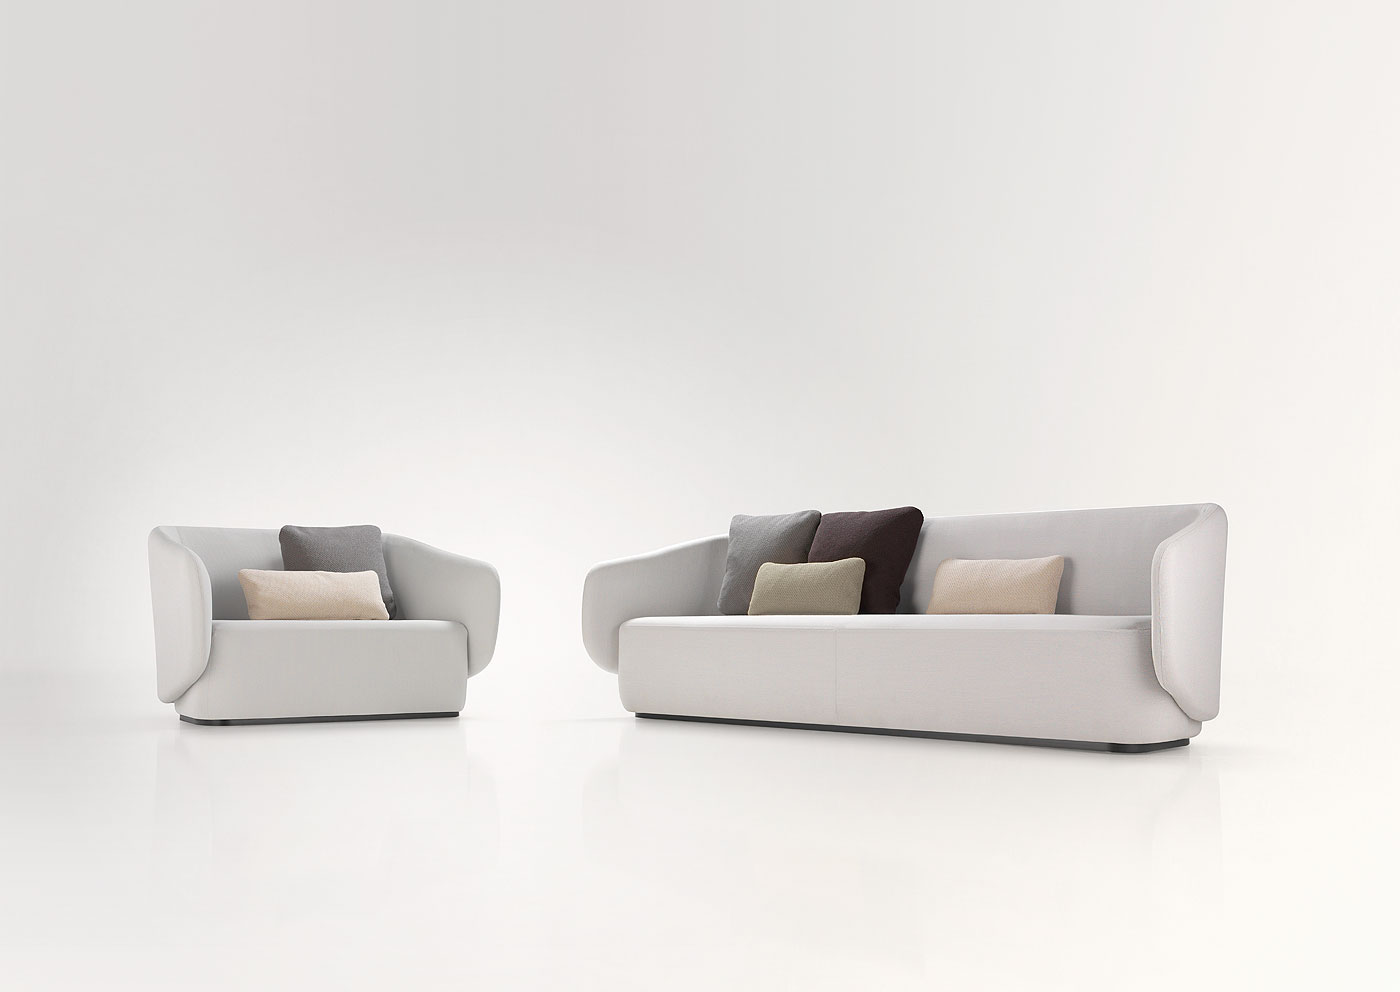 sofa-yon-pau-design-lavernia-cienfuegos (1)